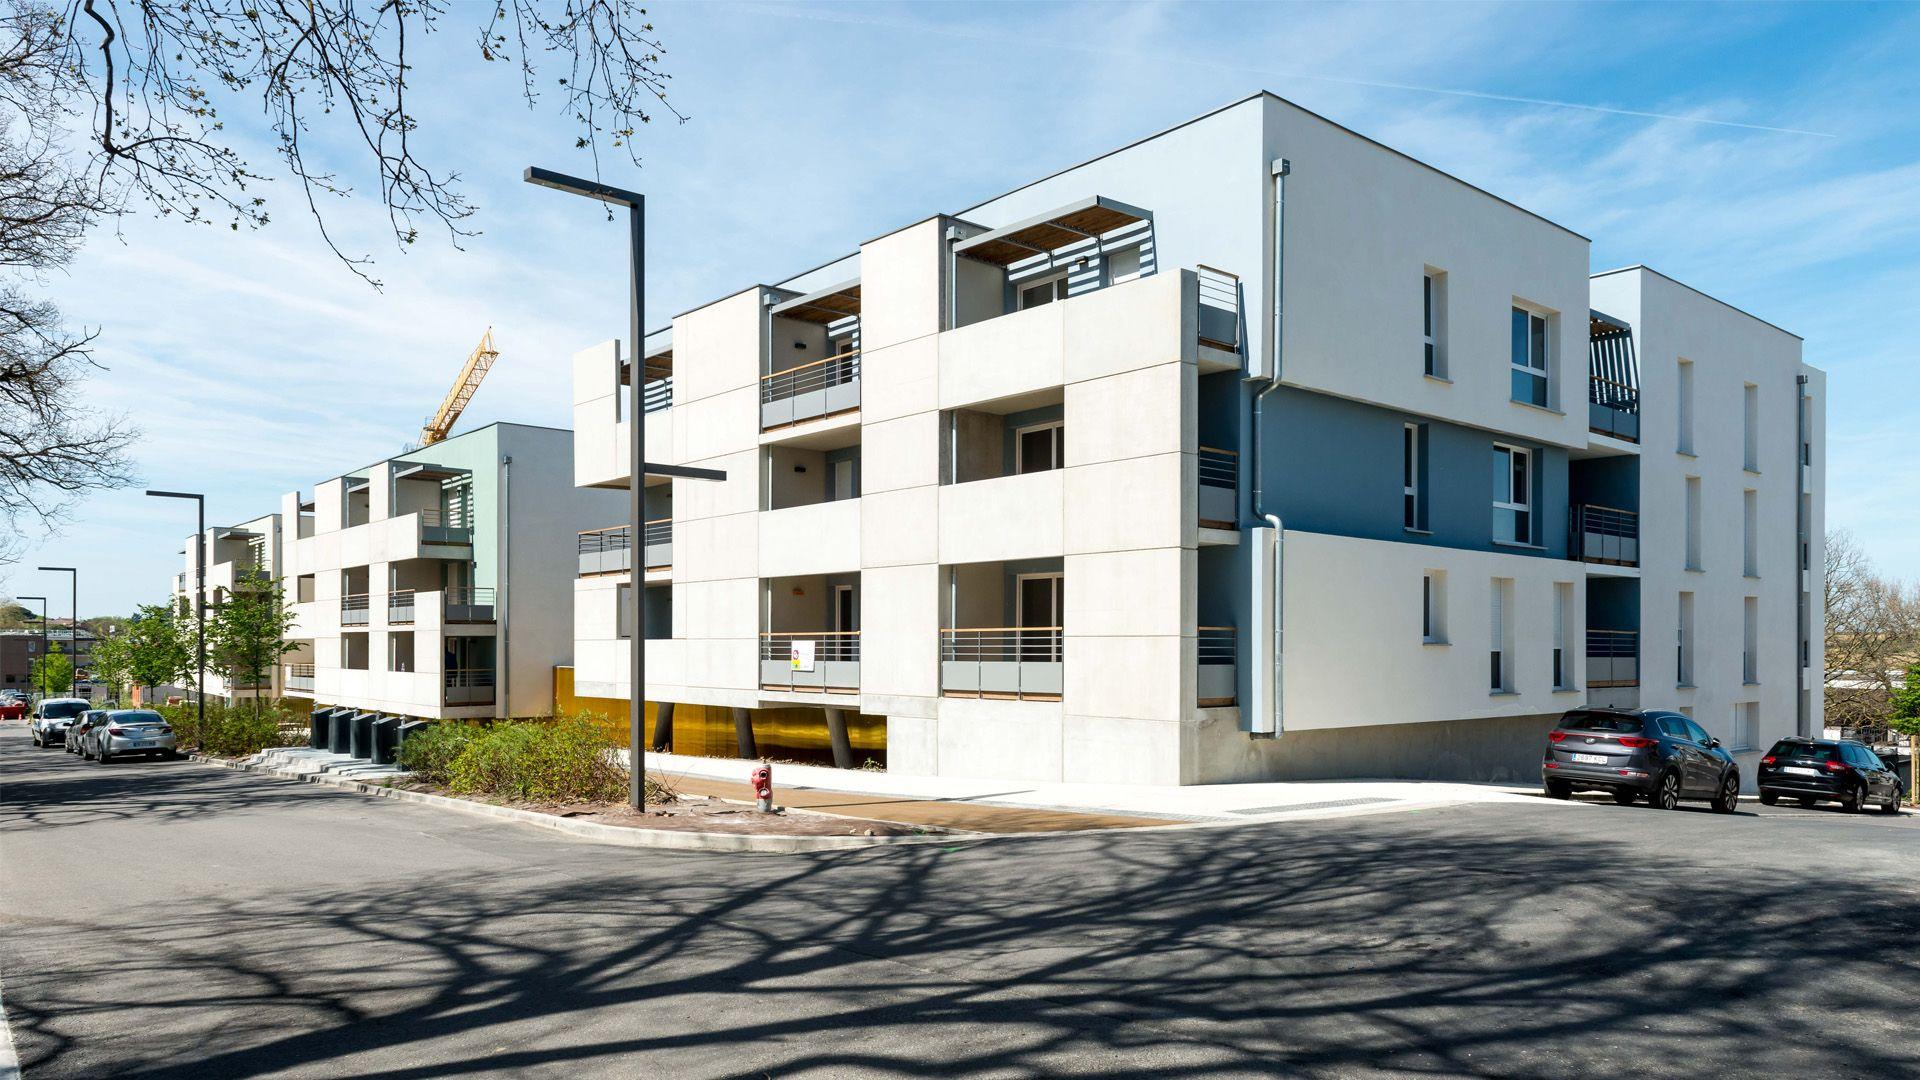 Seuil-architecture-residence-senior-zac-tucard-saint-orens-slid